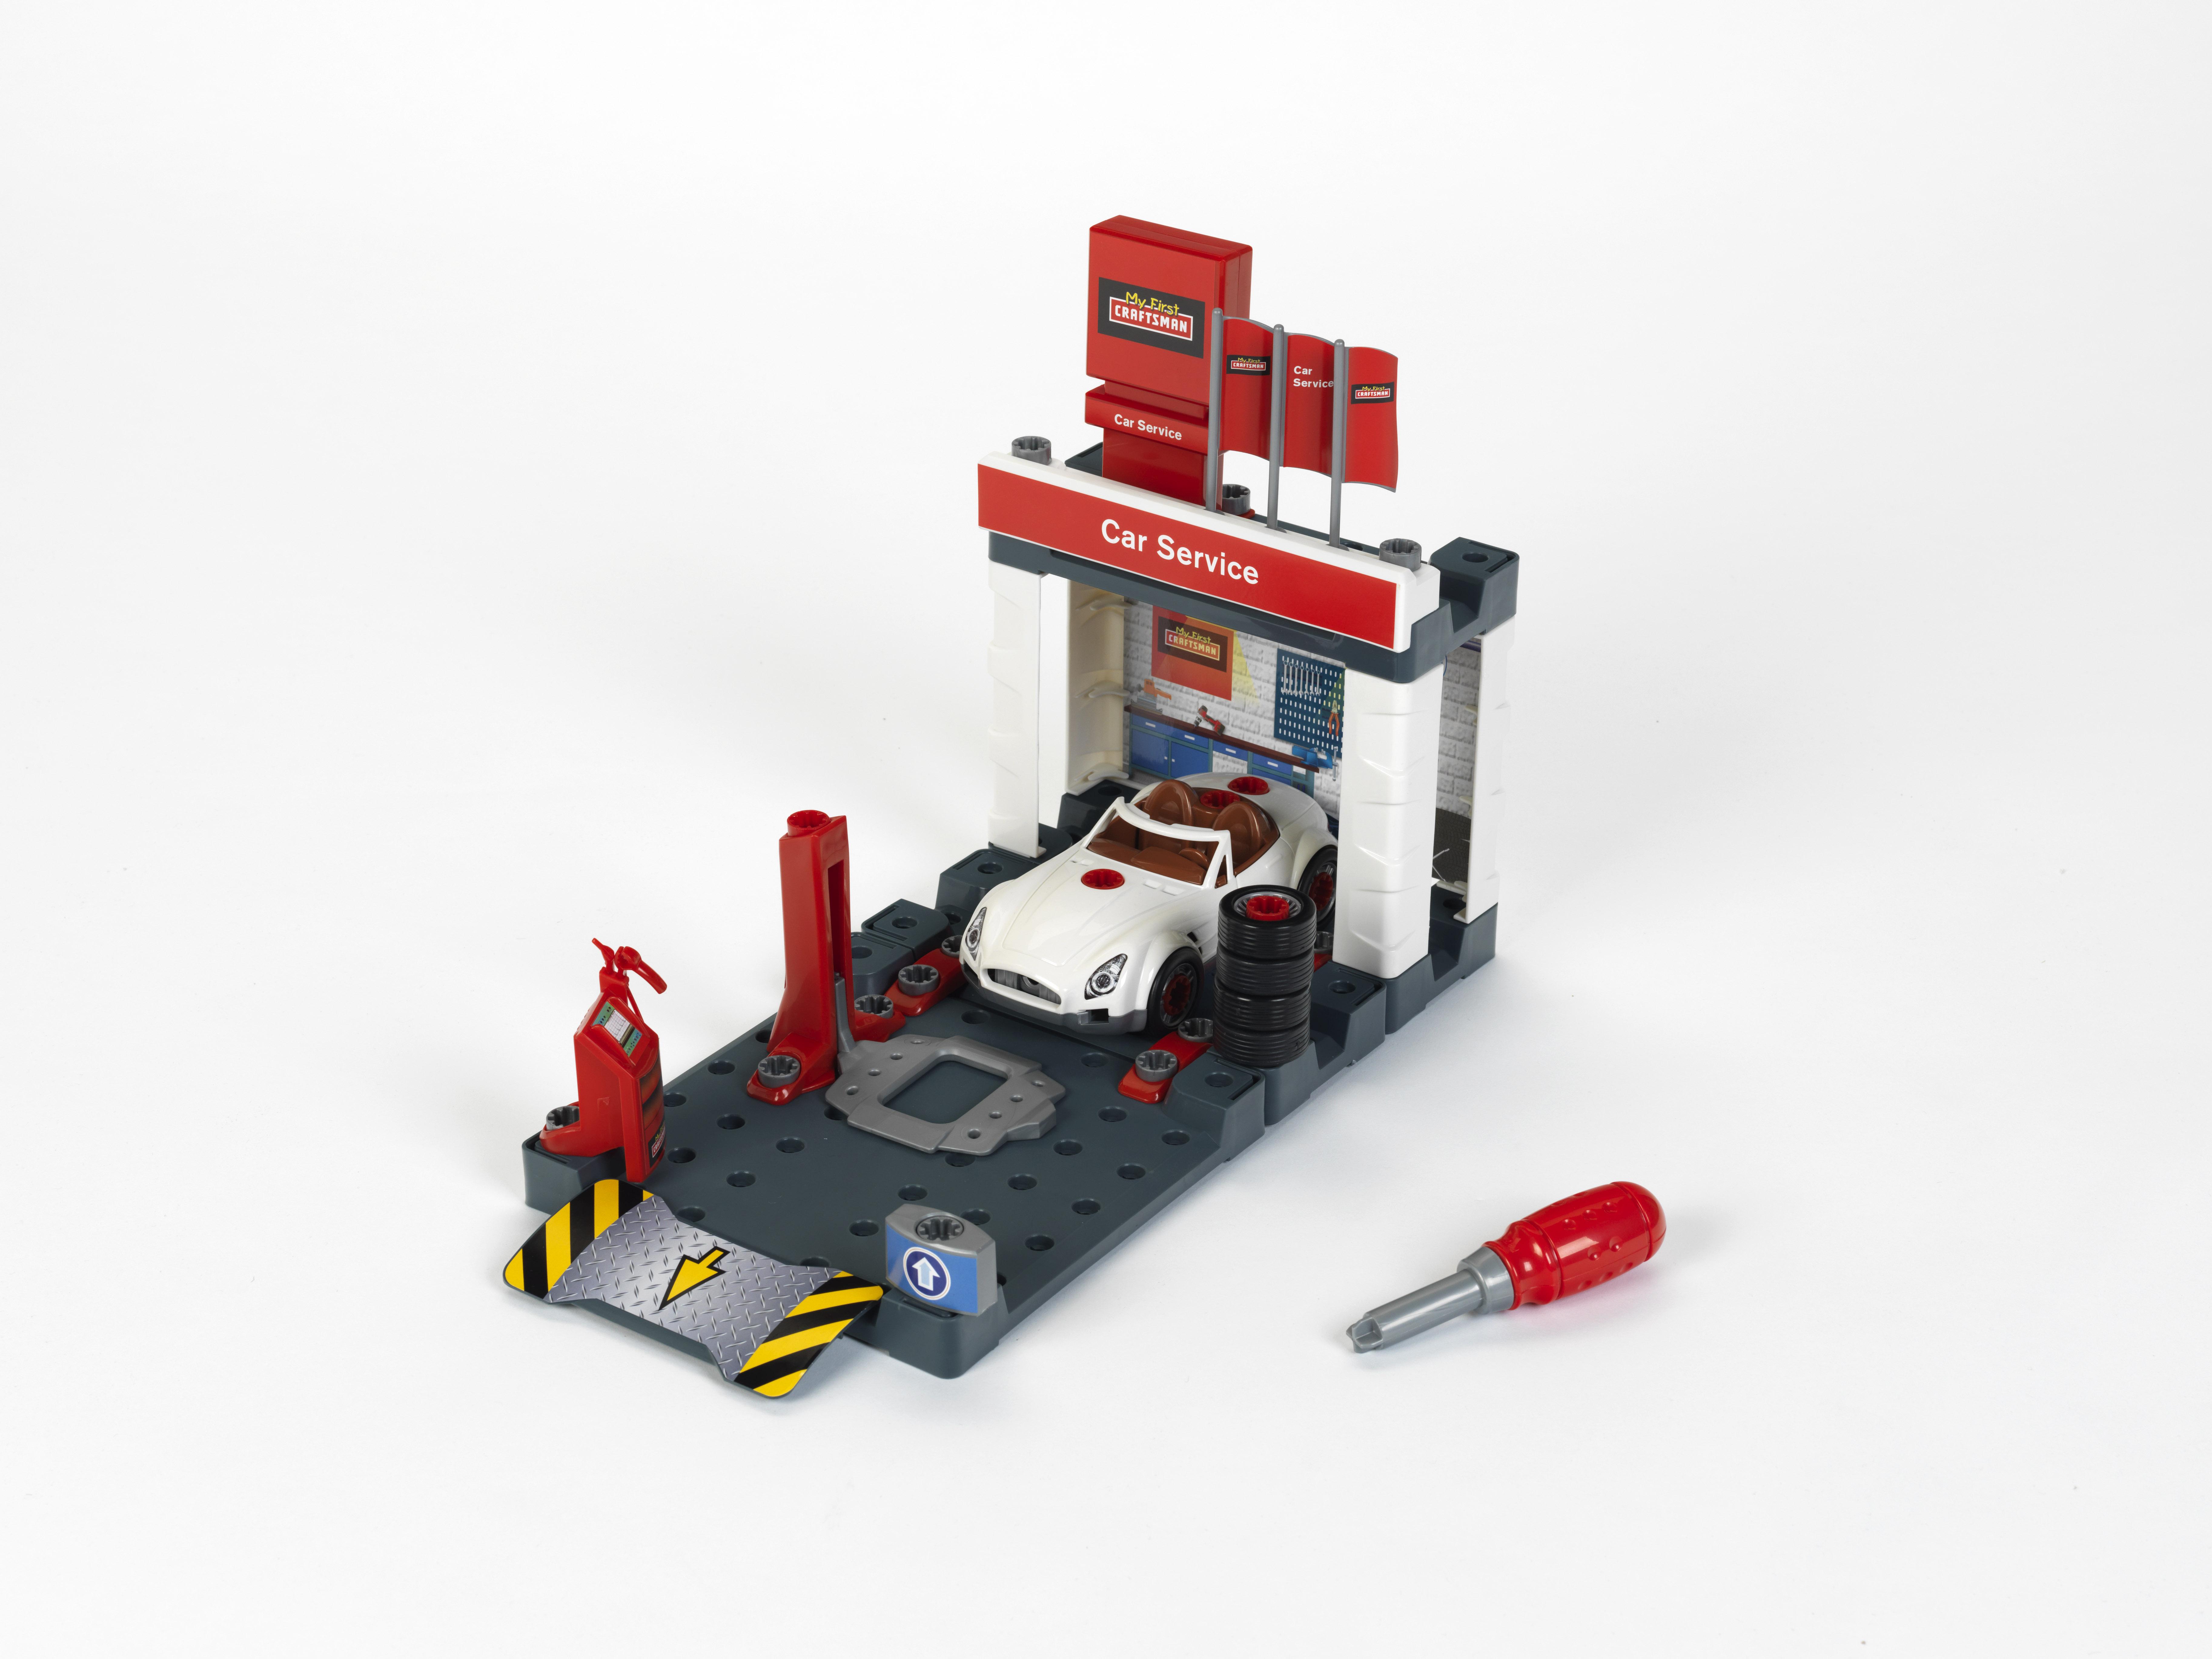 My First Craftsman Car Service Station Playset PartNumber: 004W006653597001P KsnValue: 6653597 MfgPartNumber: 8648S